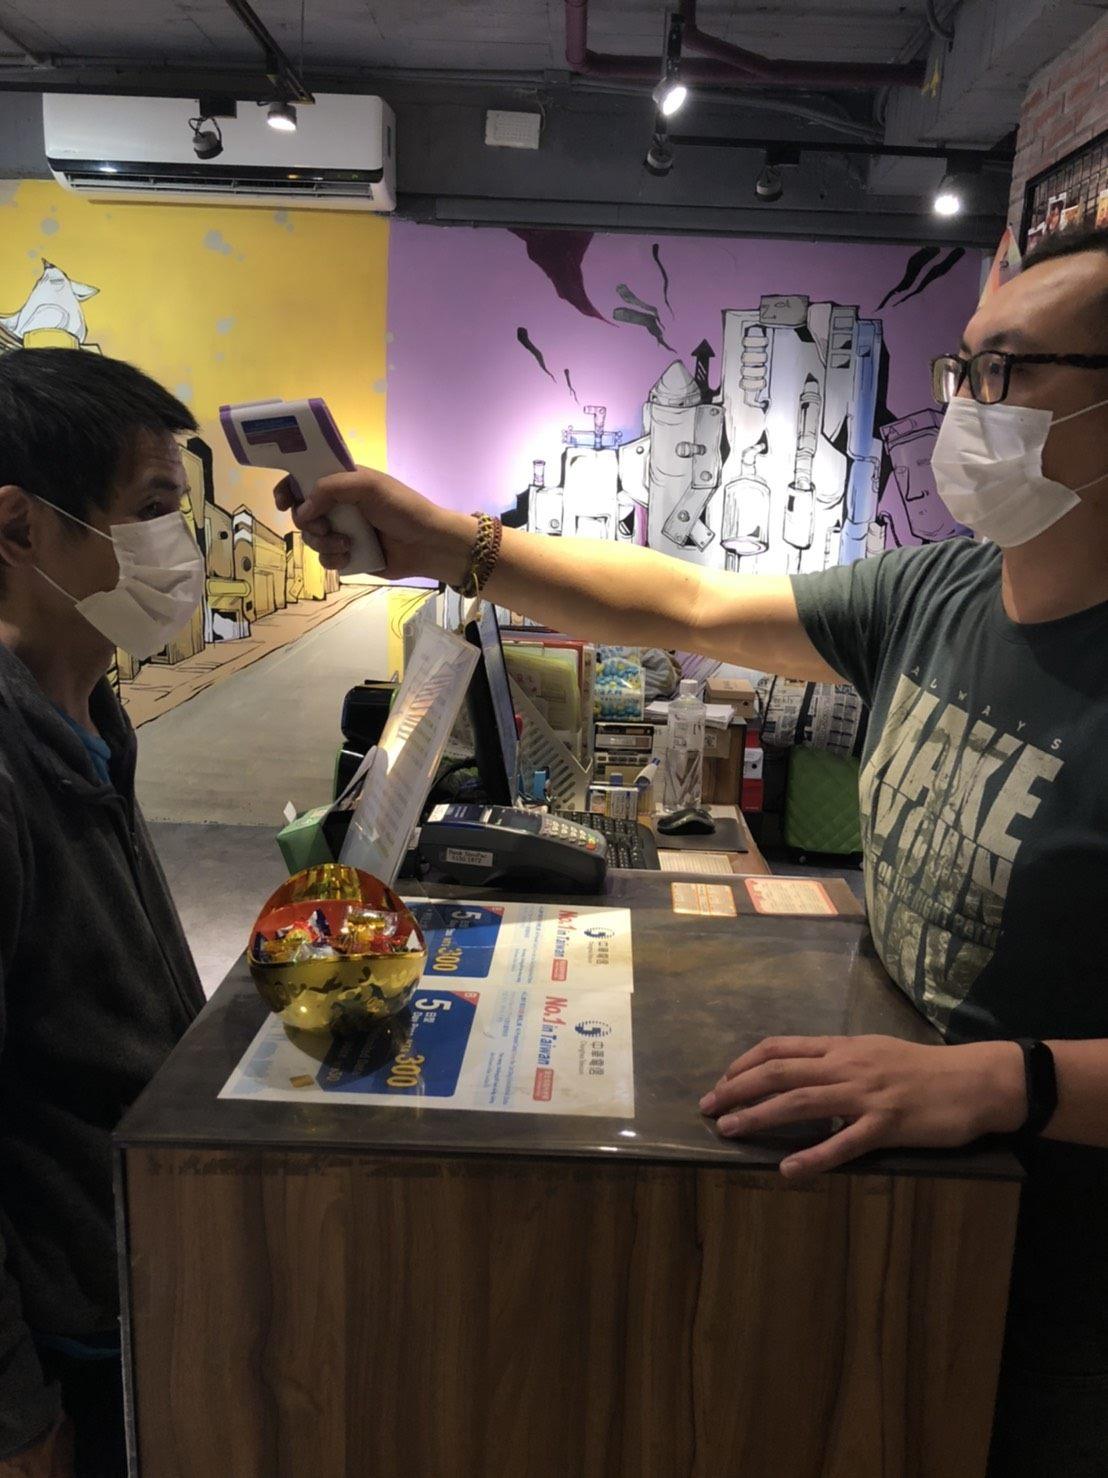 Hotel worker at quarantine hotel checks guest's temperature